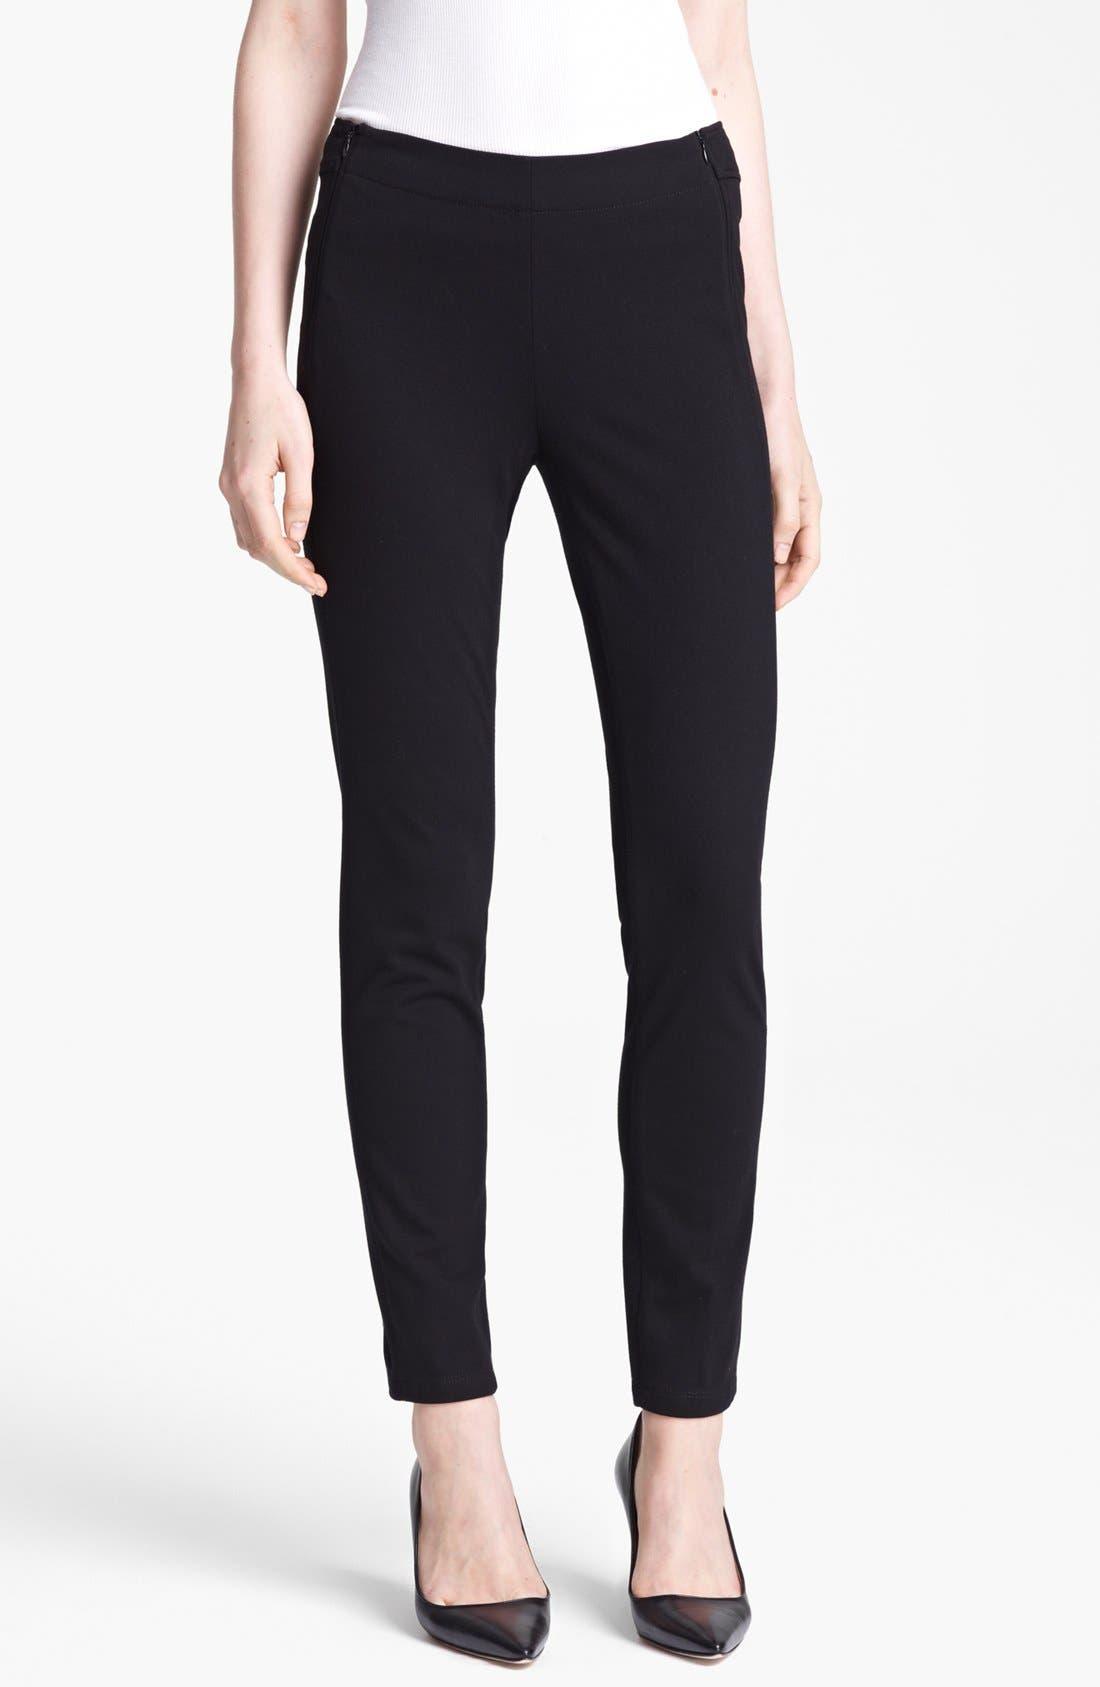 Main Image - Moschino Cheap & Chic Side Zip Leggings